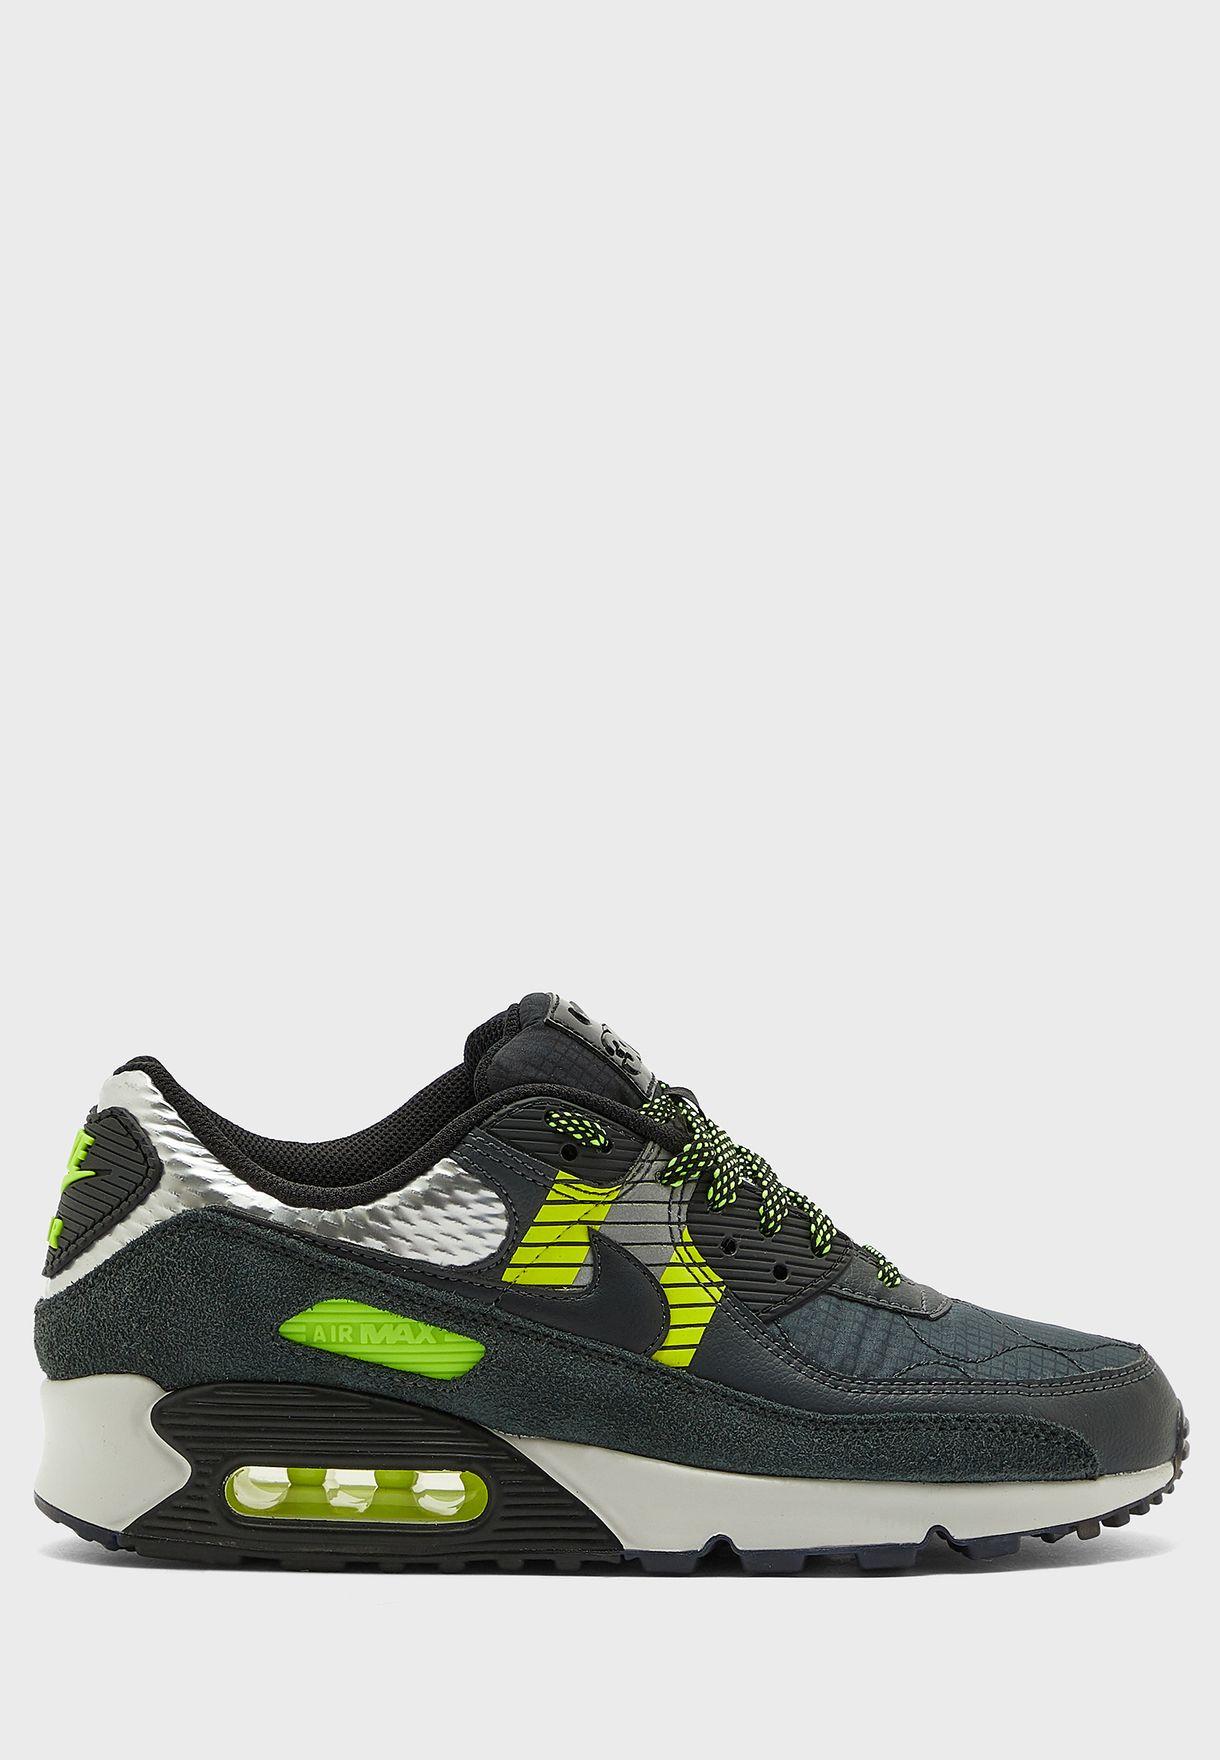 حذاء اير ماكس 90 3 ام